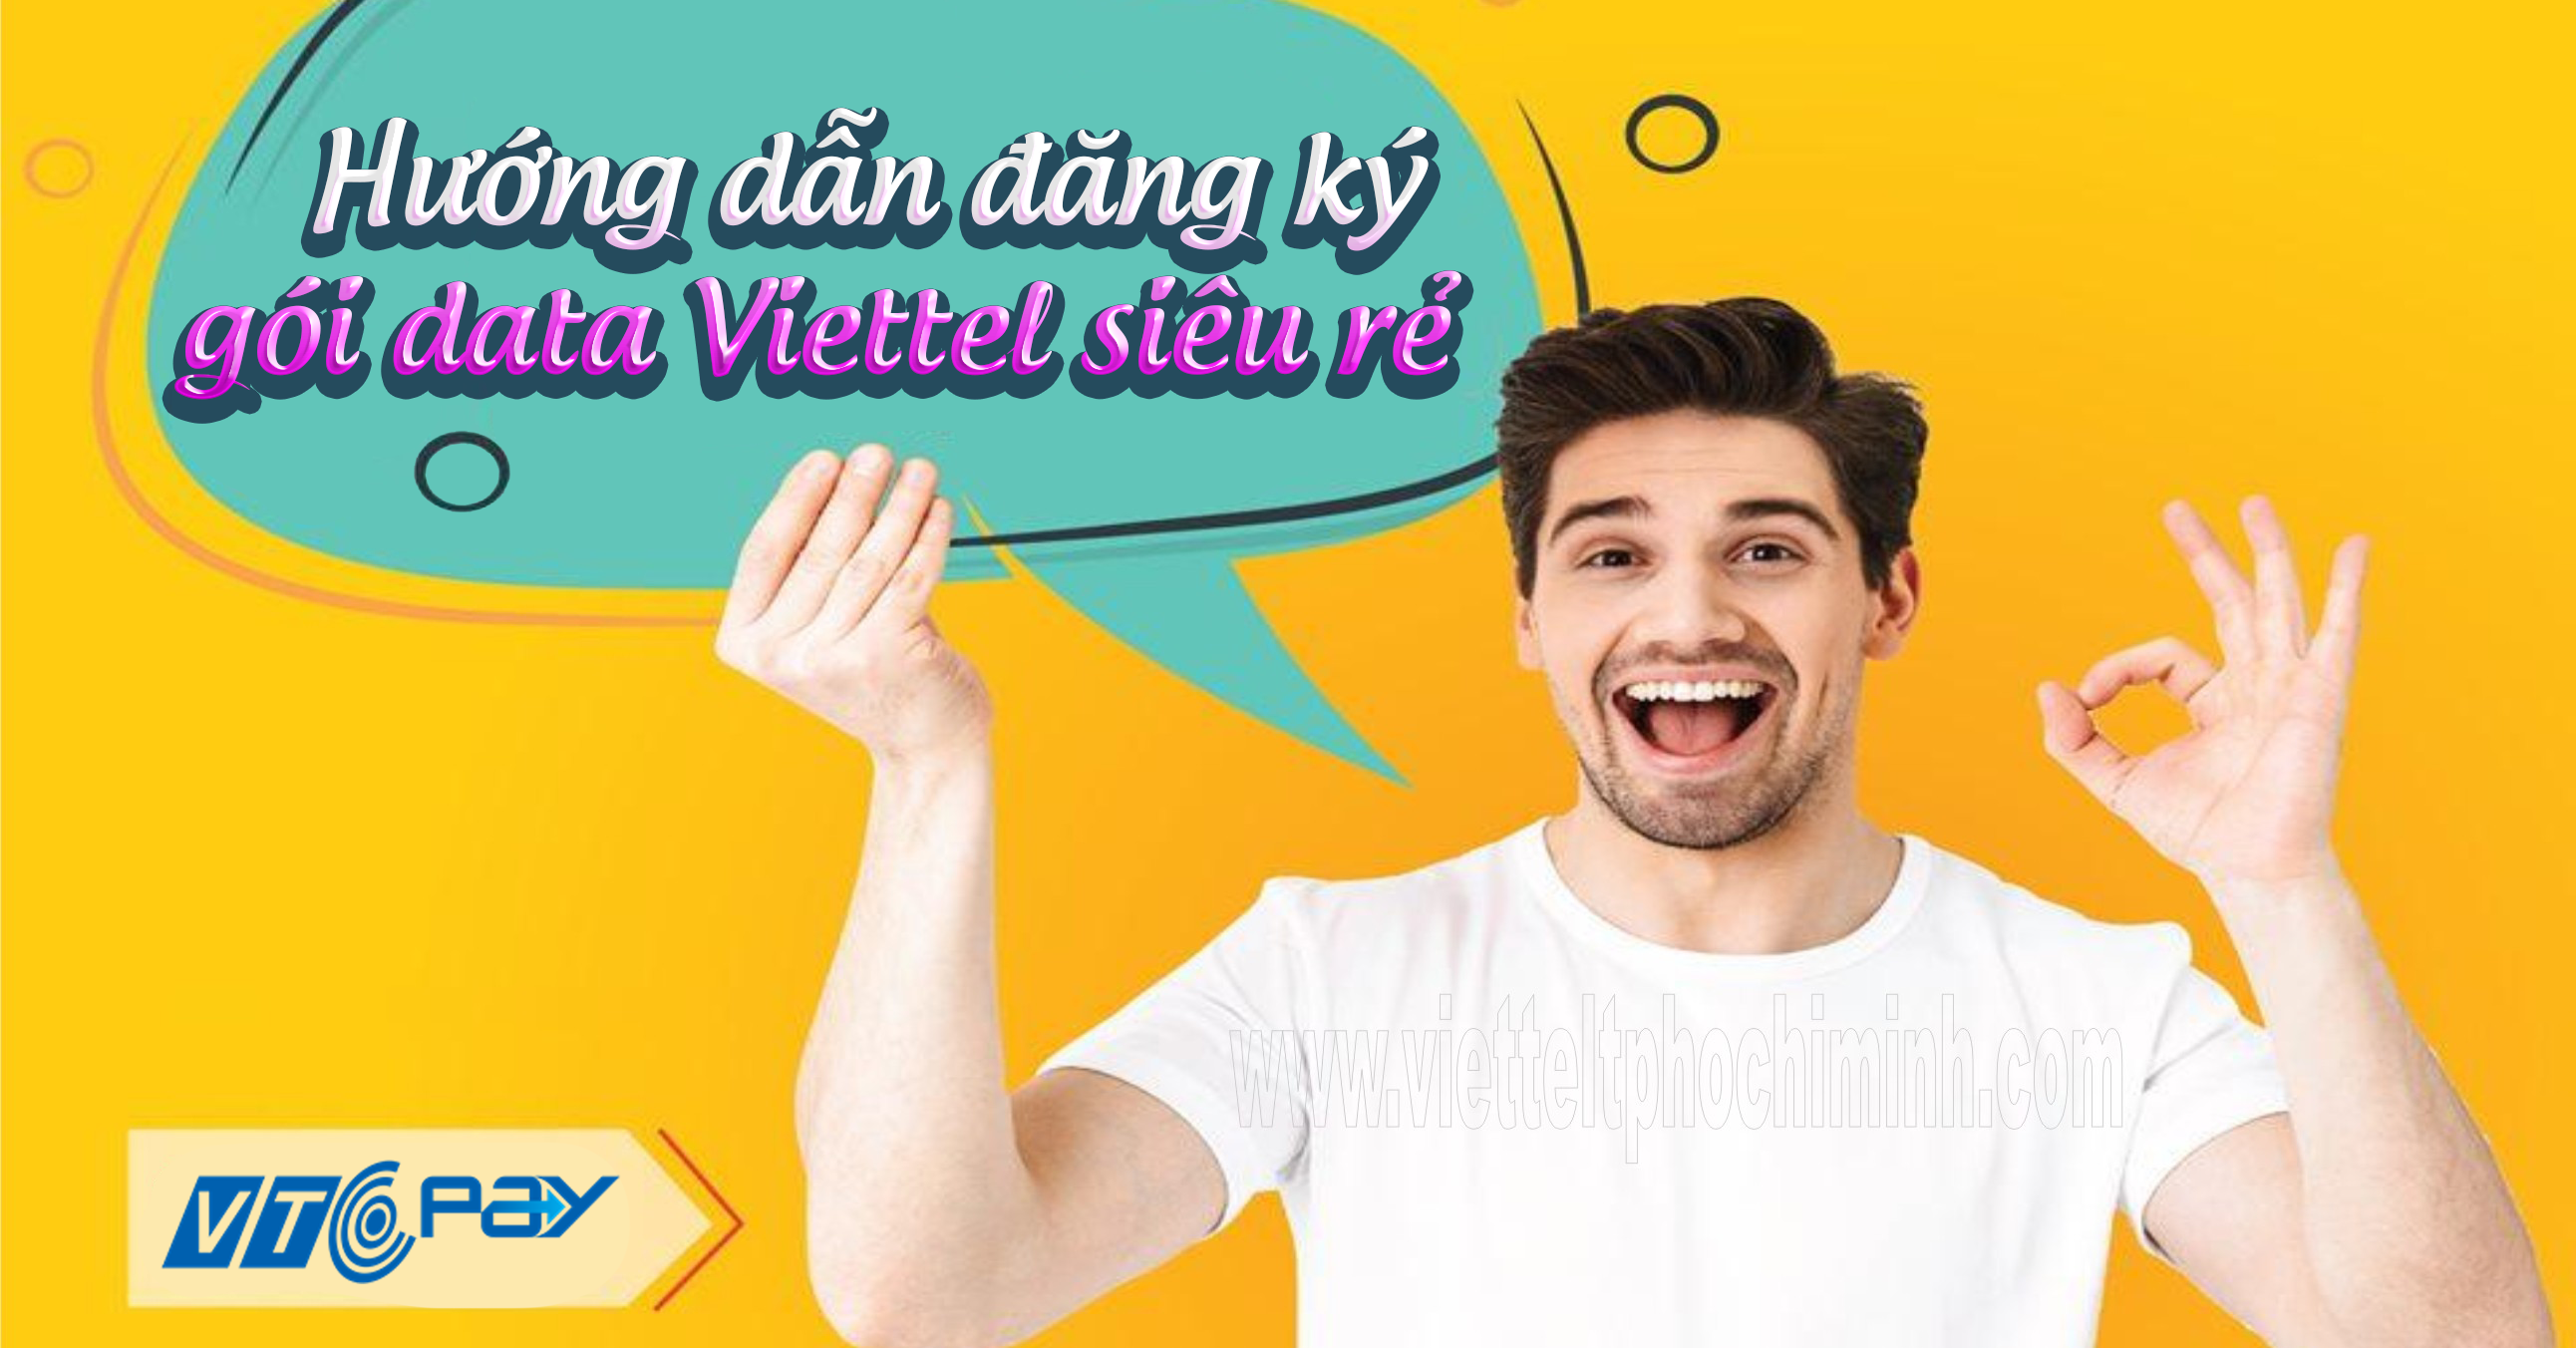 huong-dan-dang-ky-goi-data-viettel-sieu-re